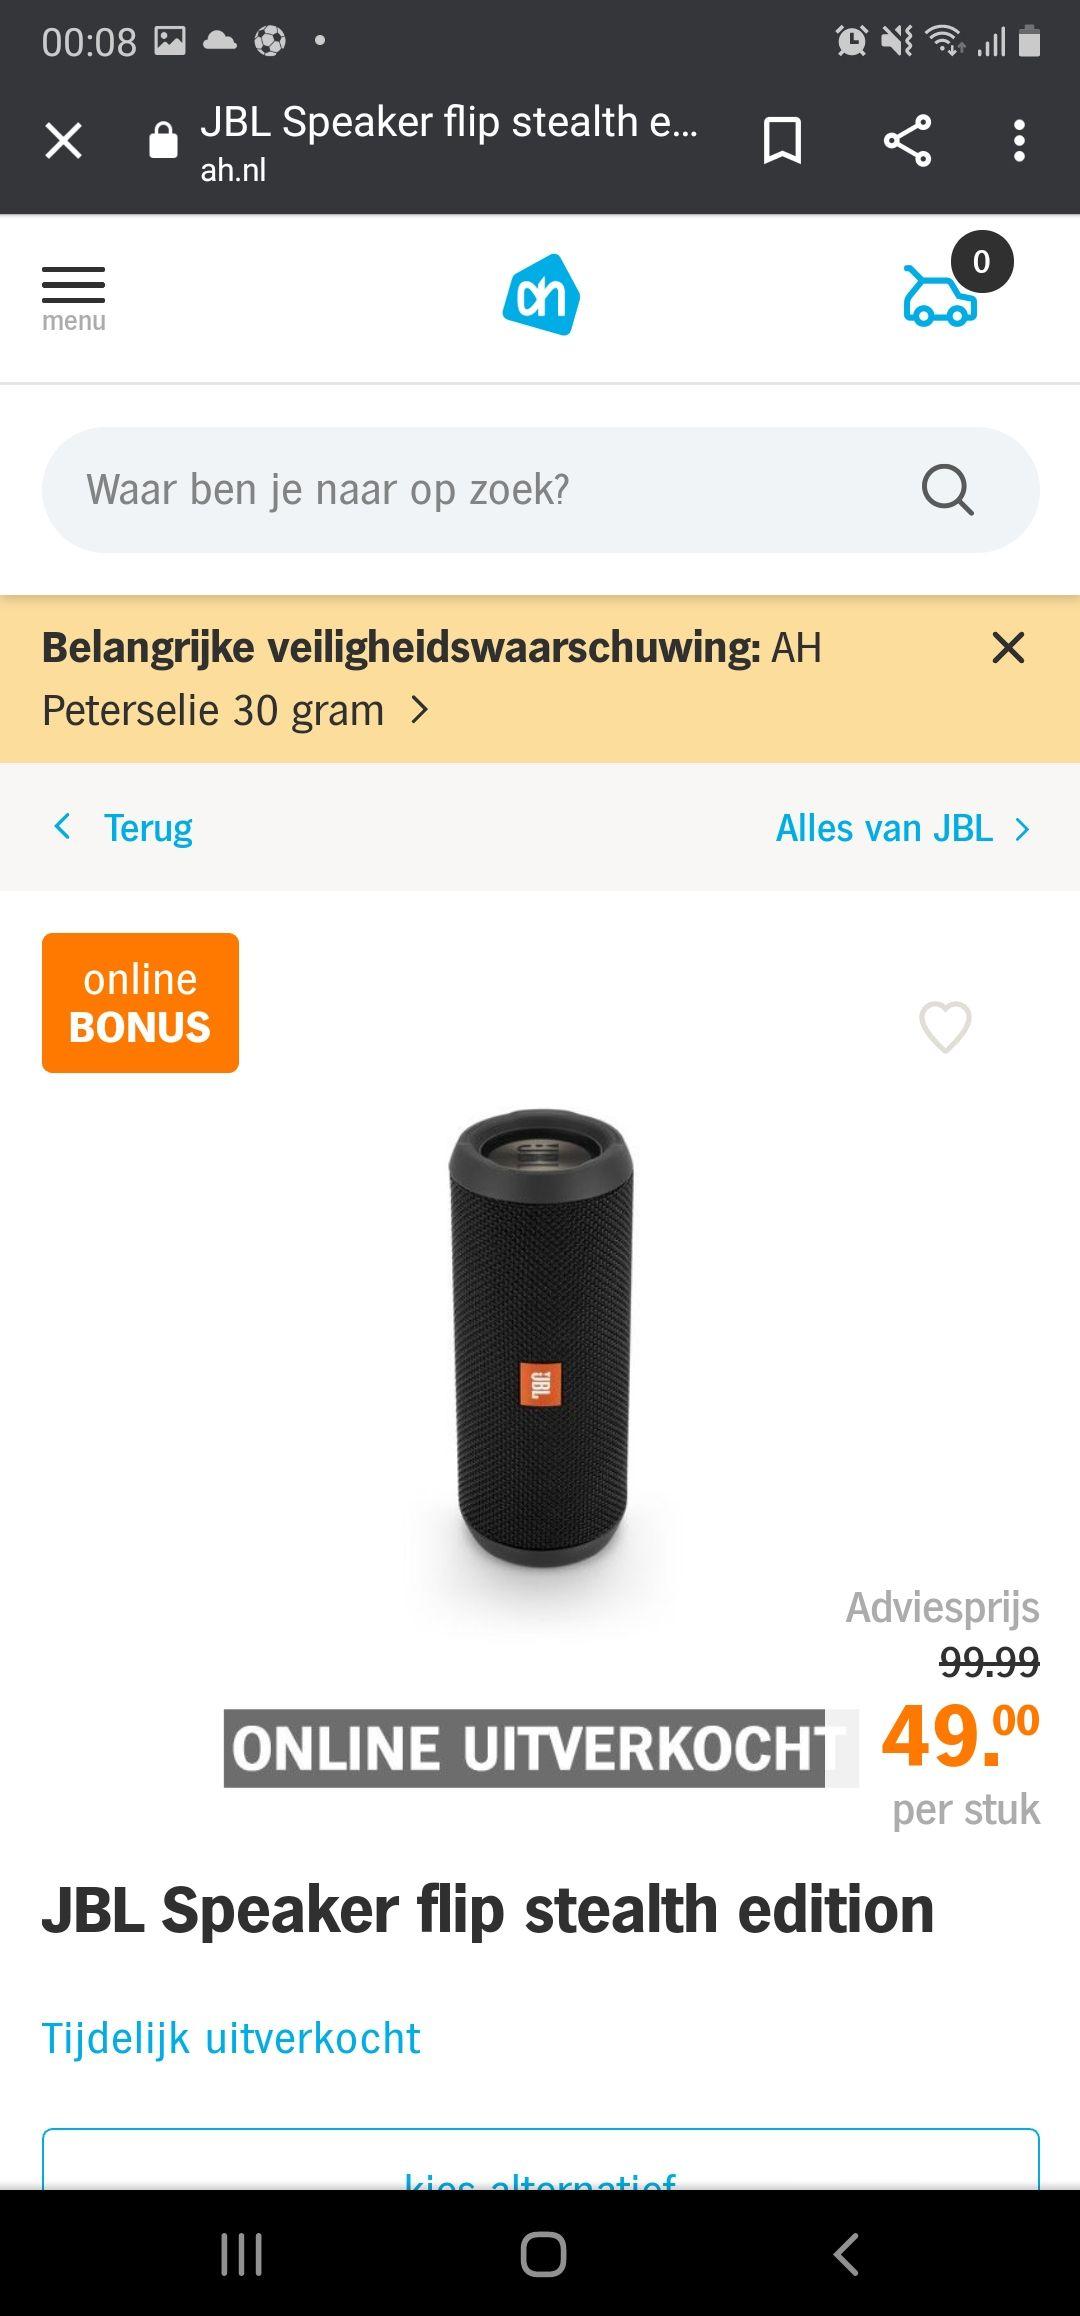 JBL Speaker flip stealth edition